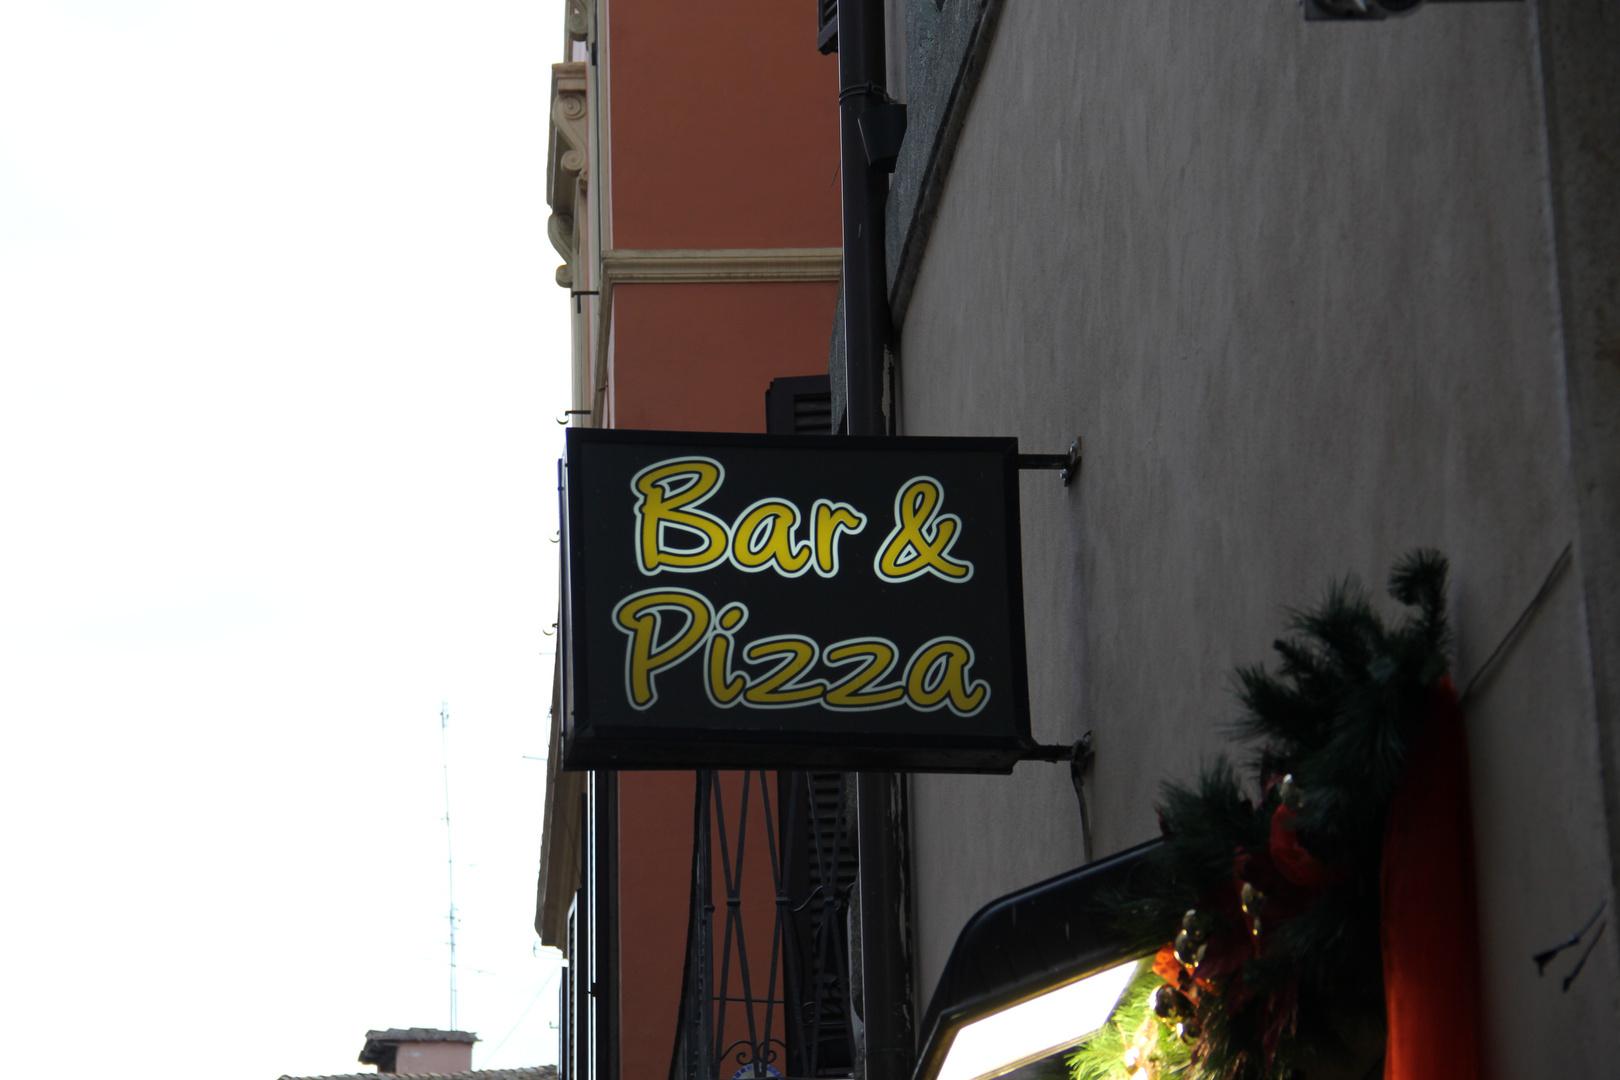 Bar & Pizza